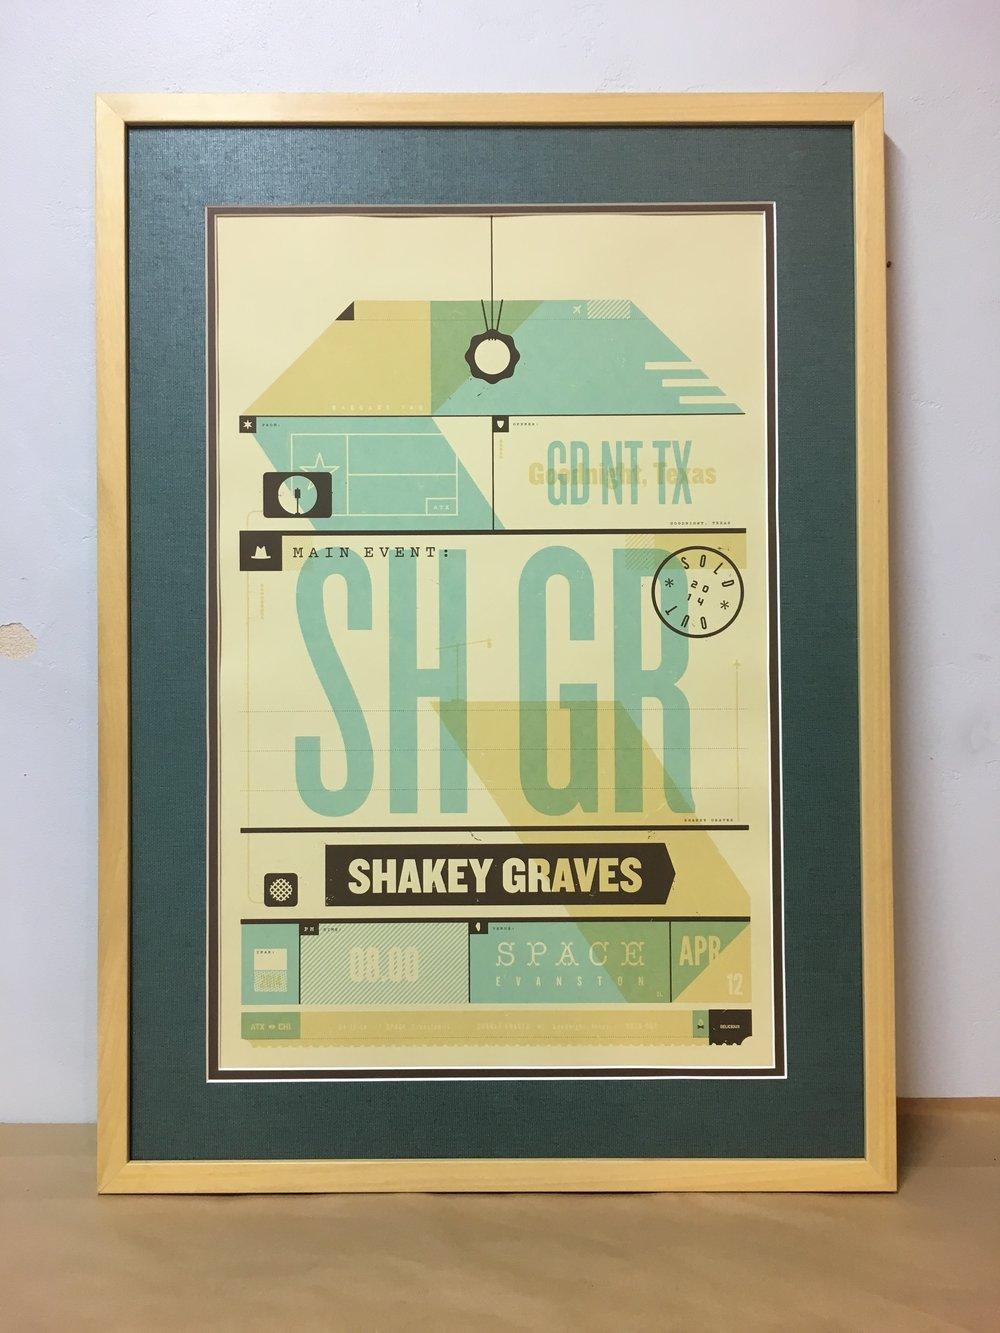 Shakey Graves Concert Poster